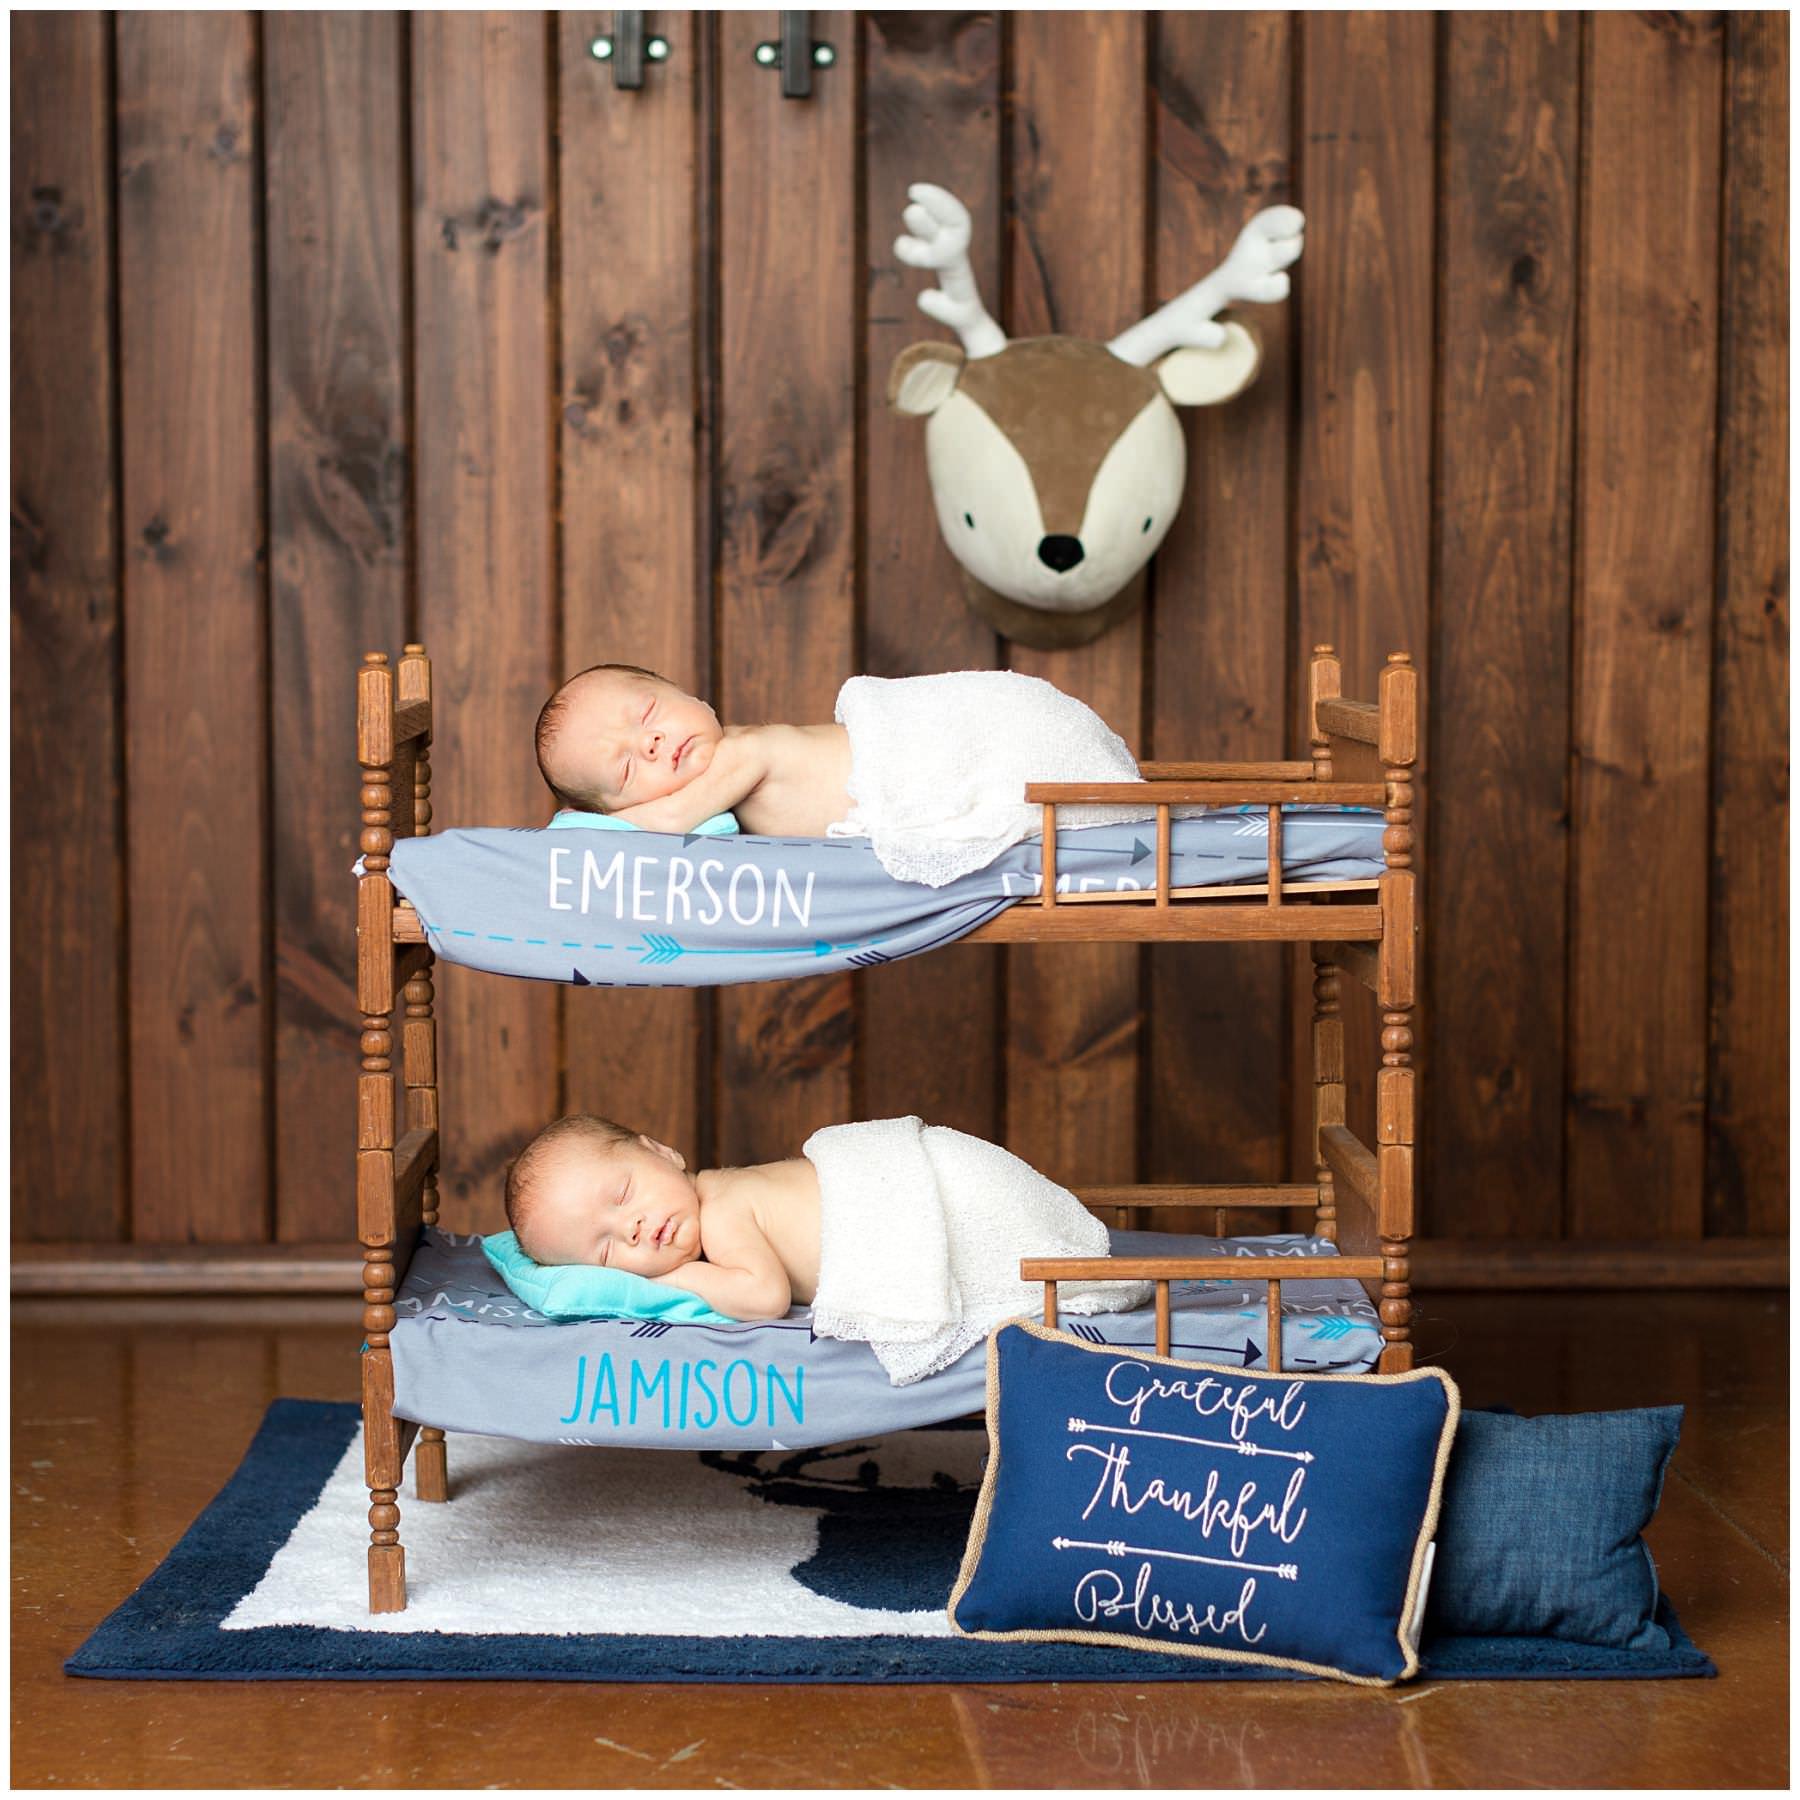 bunkbed scene with newborn twins